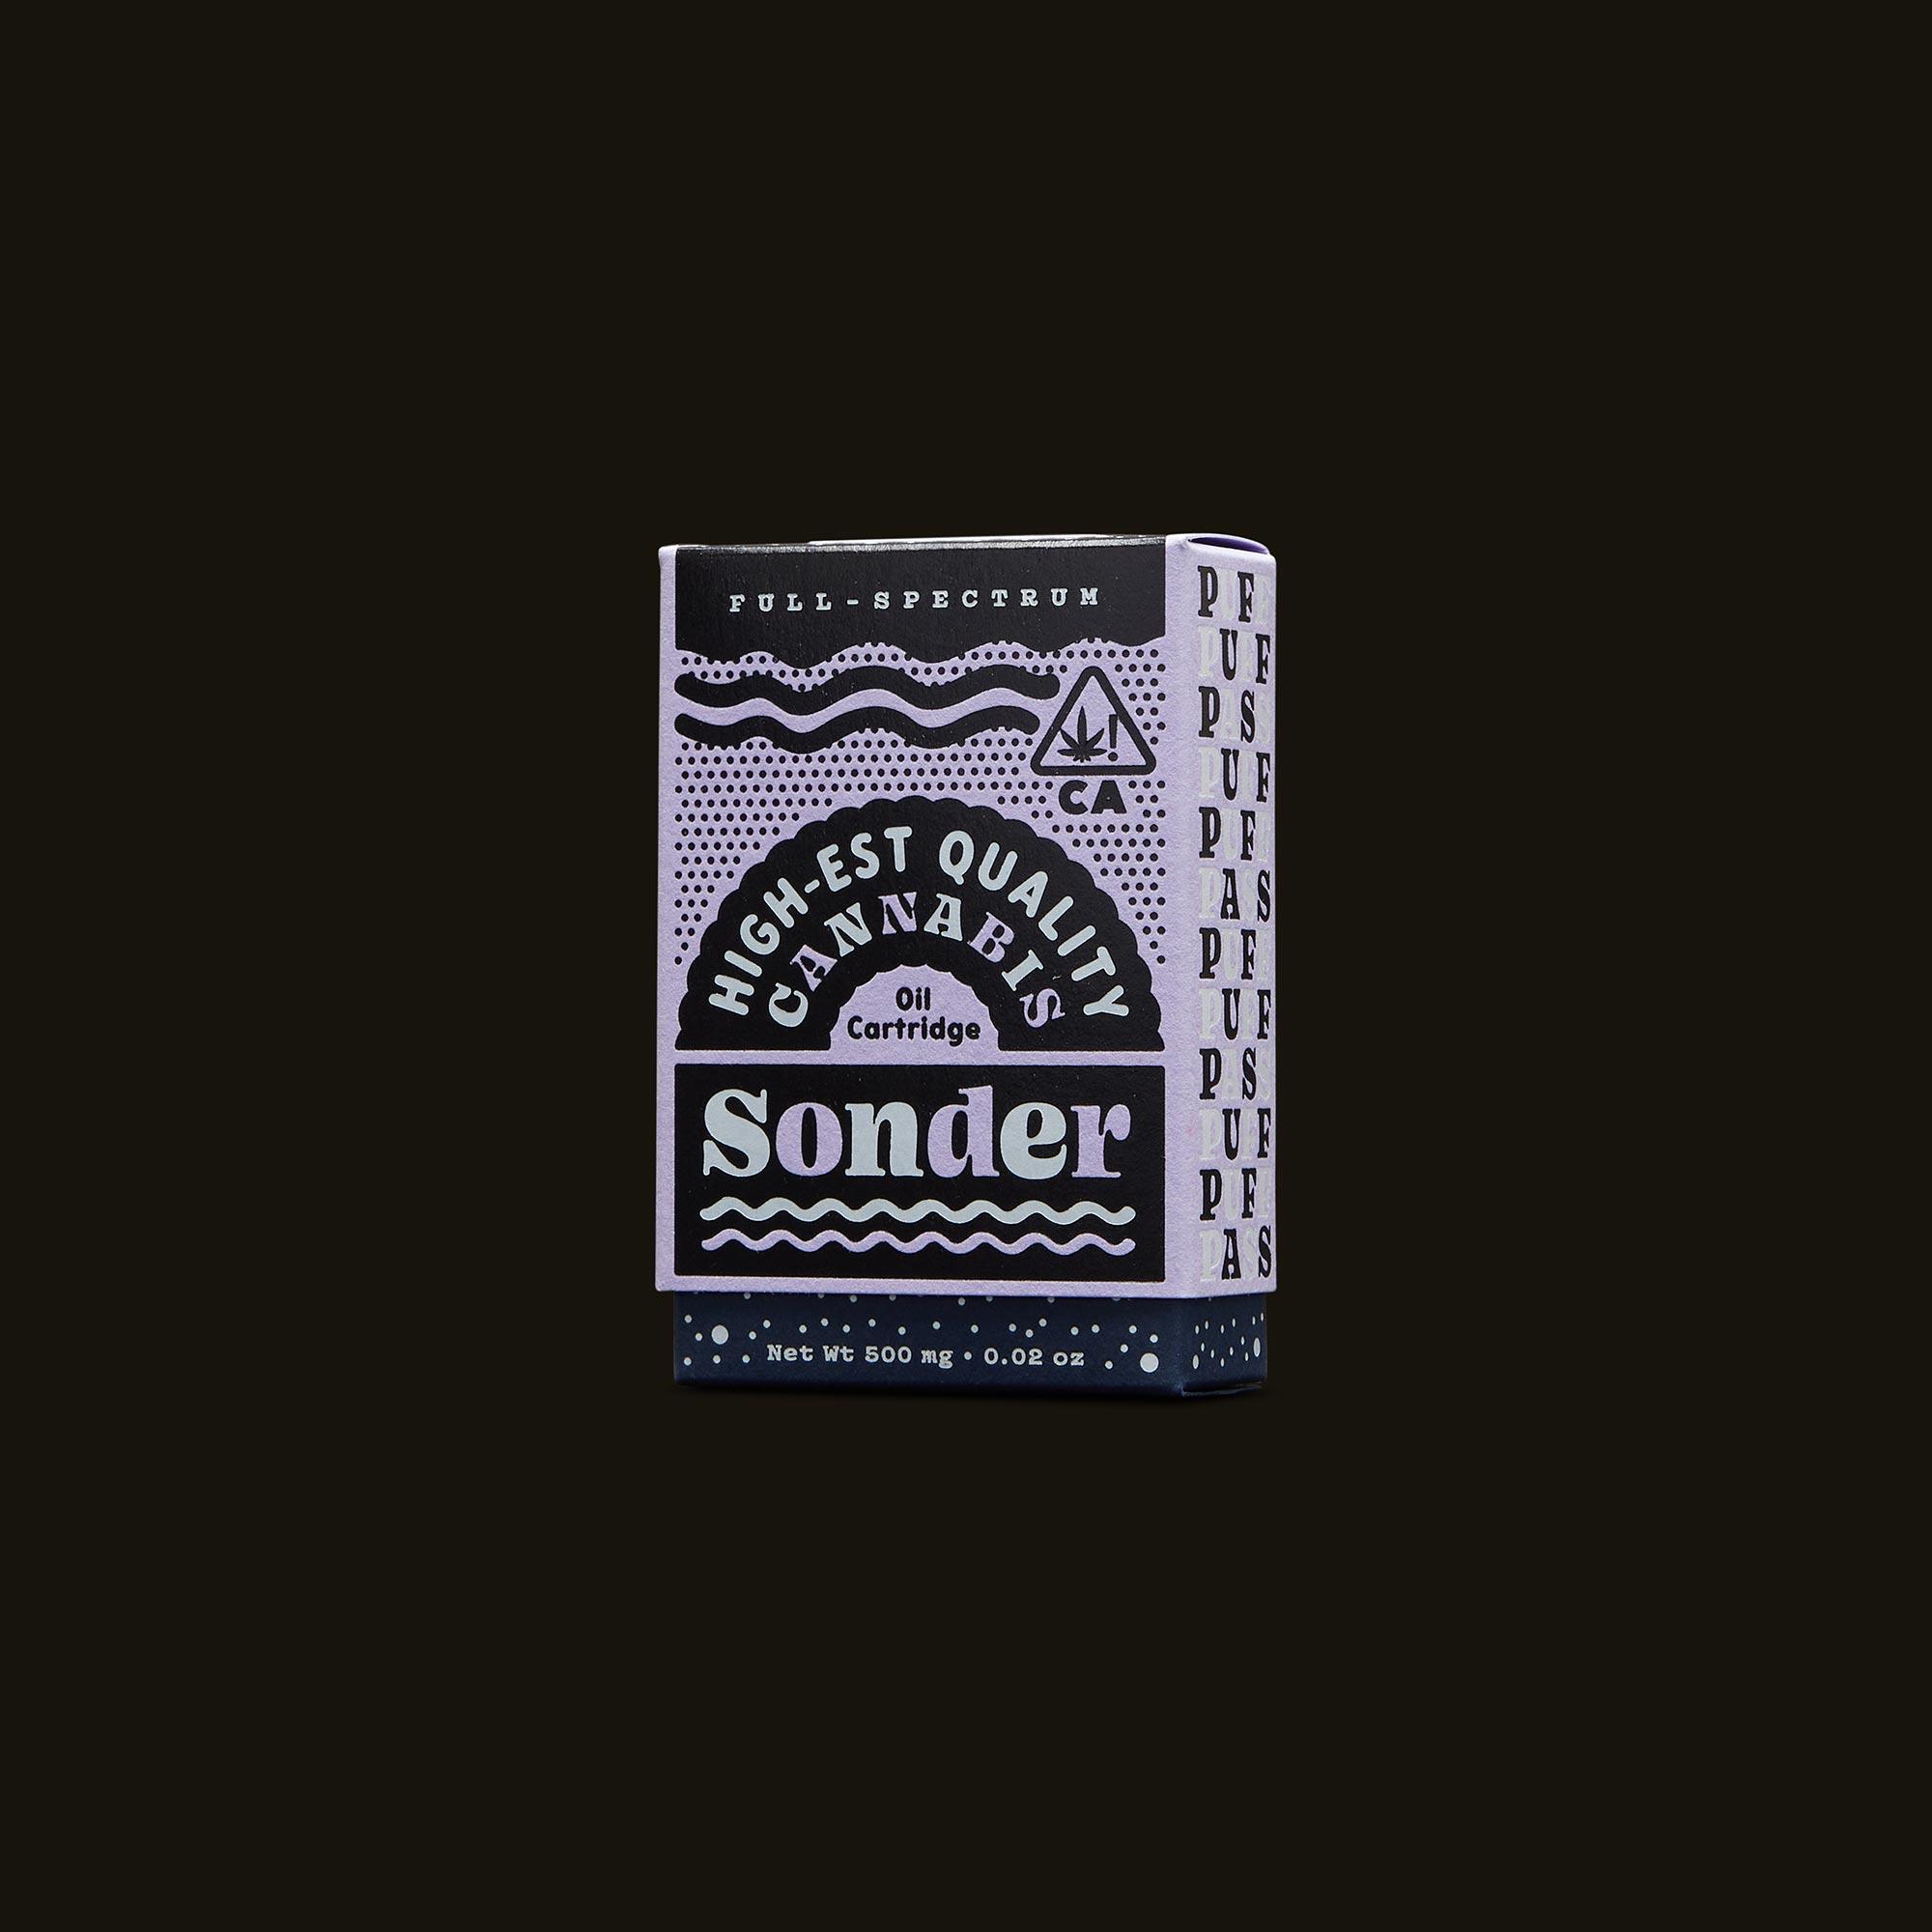 Sonder Vape Pen - Gelato Glue Cartridge